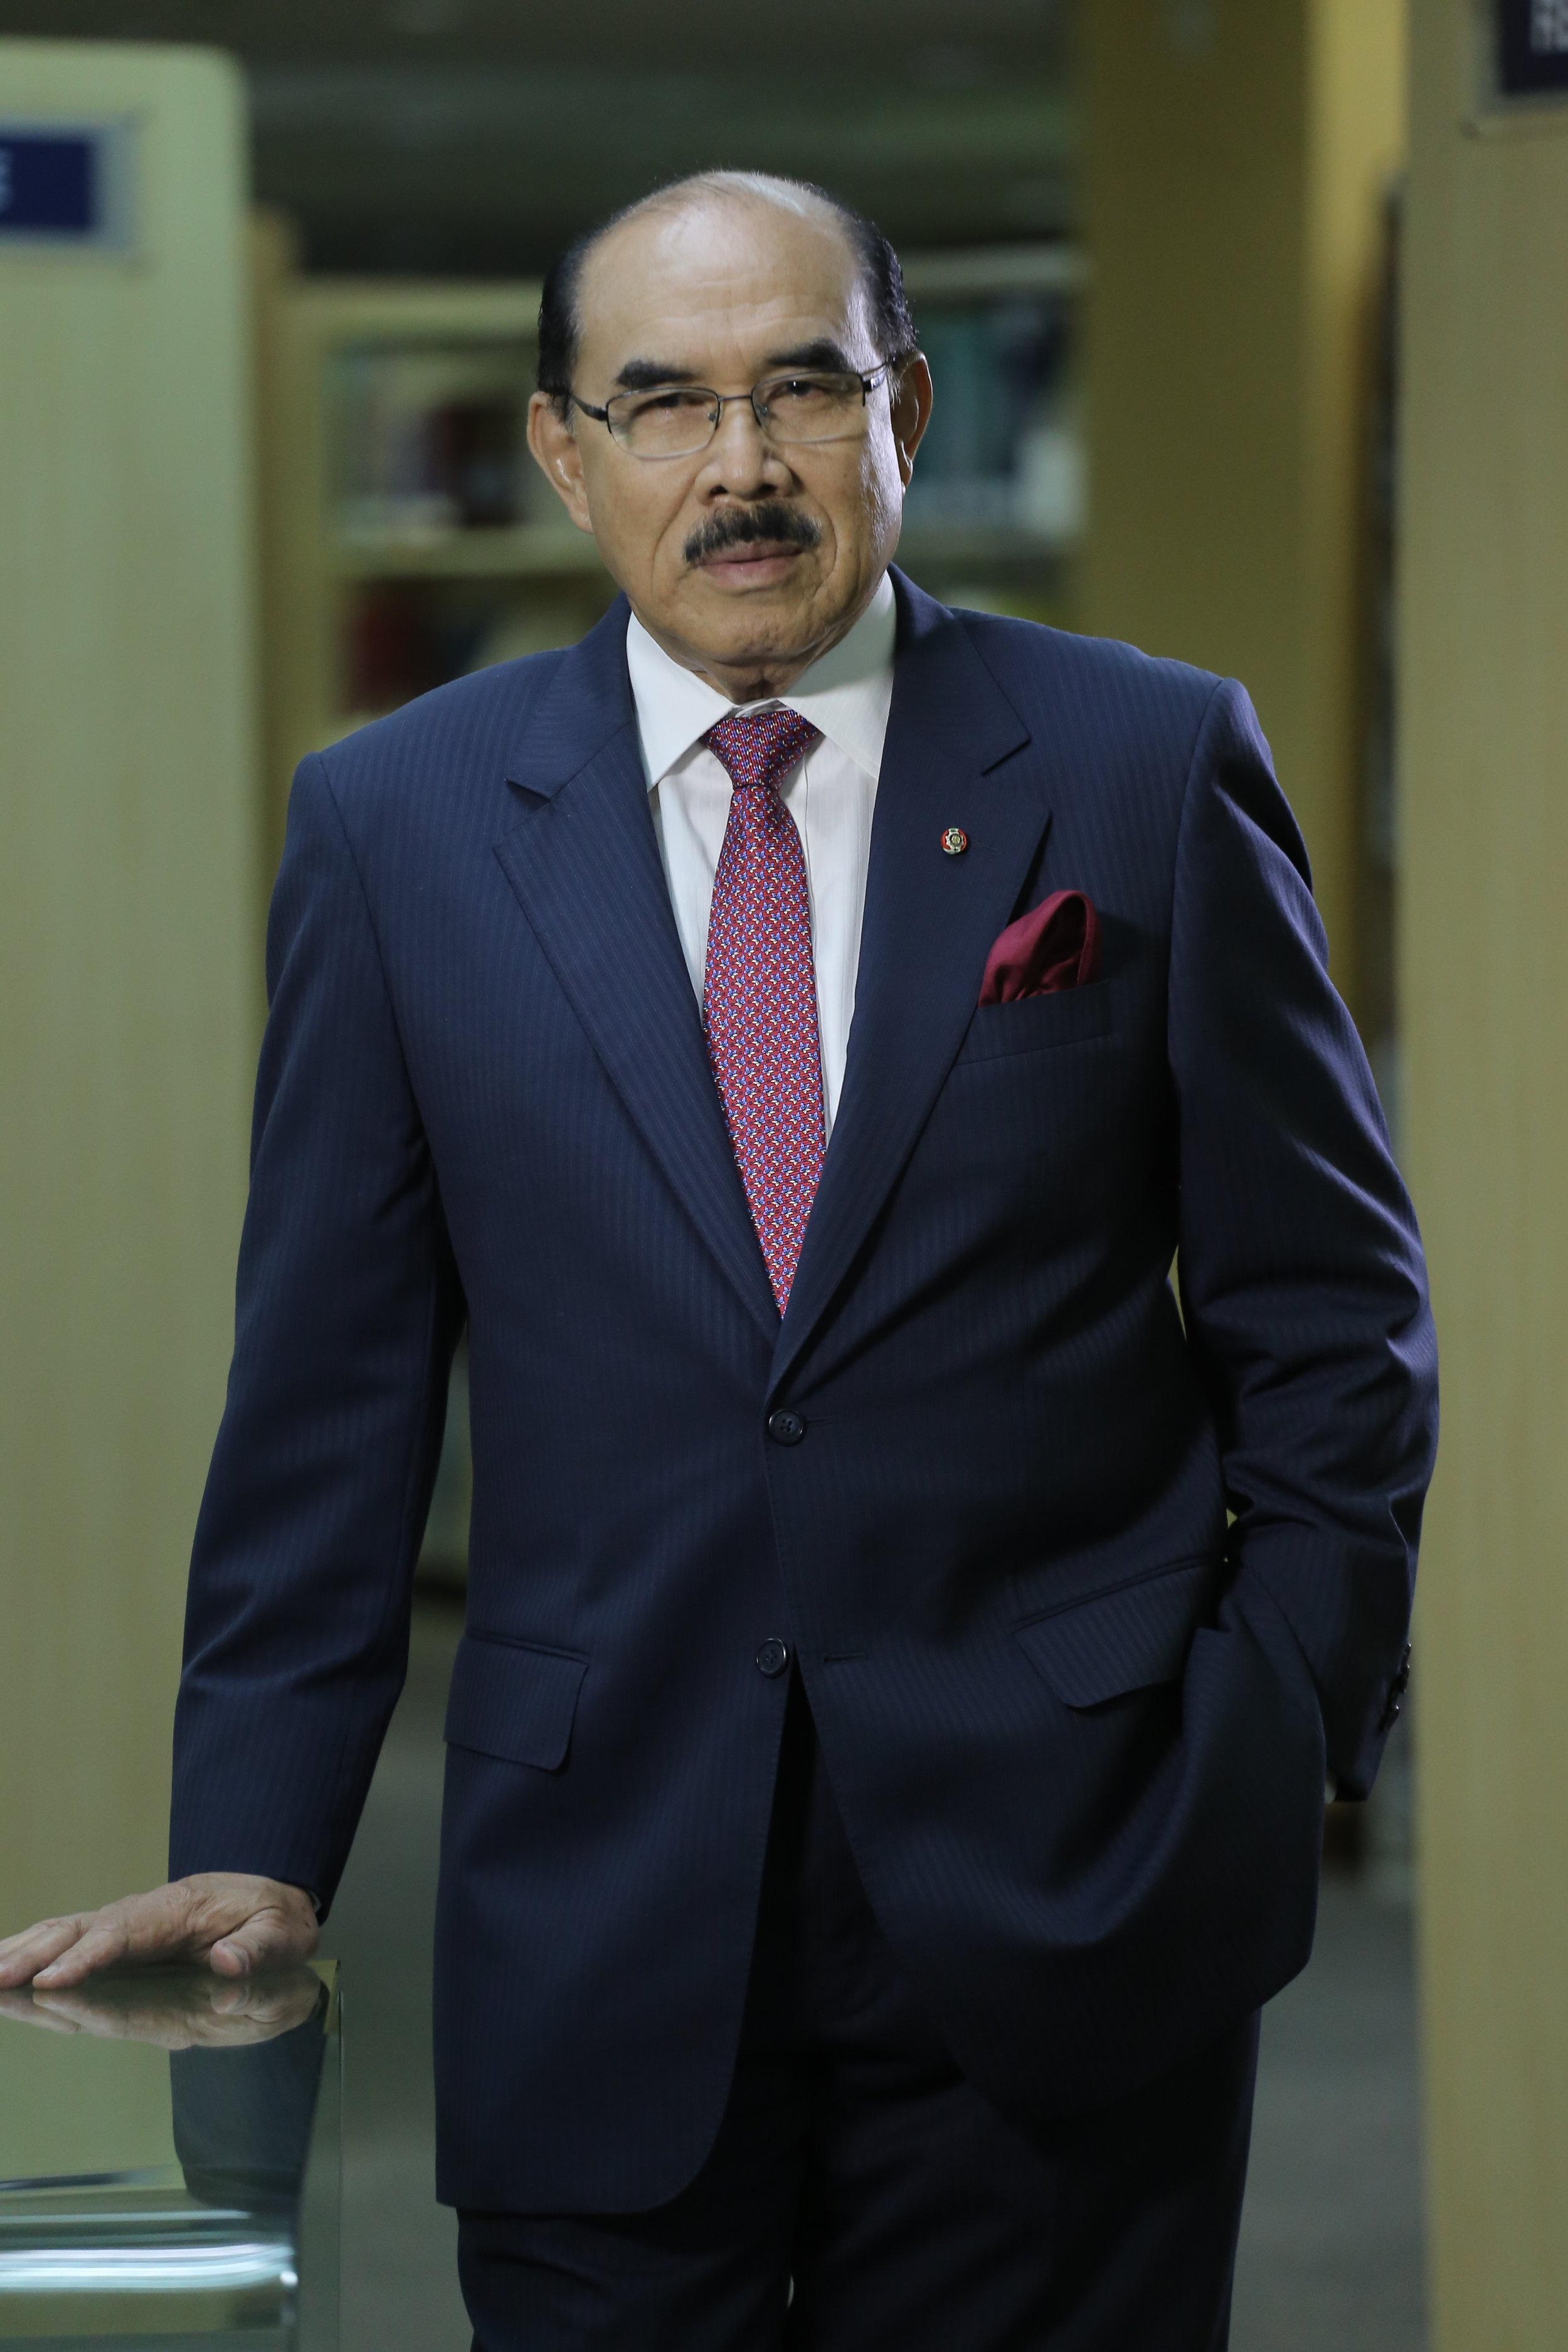 YAB Tan Sri Datuk Mustafa Mansur (Chairman)